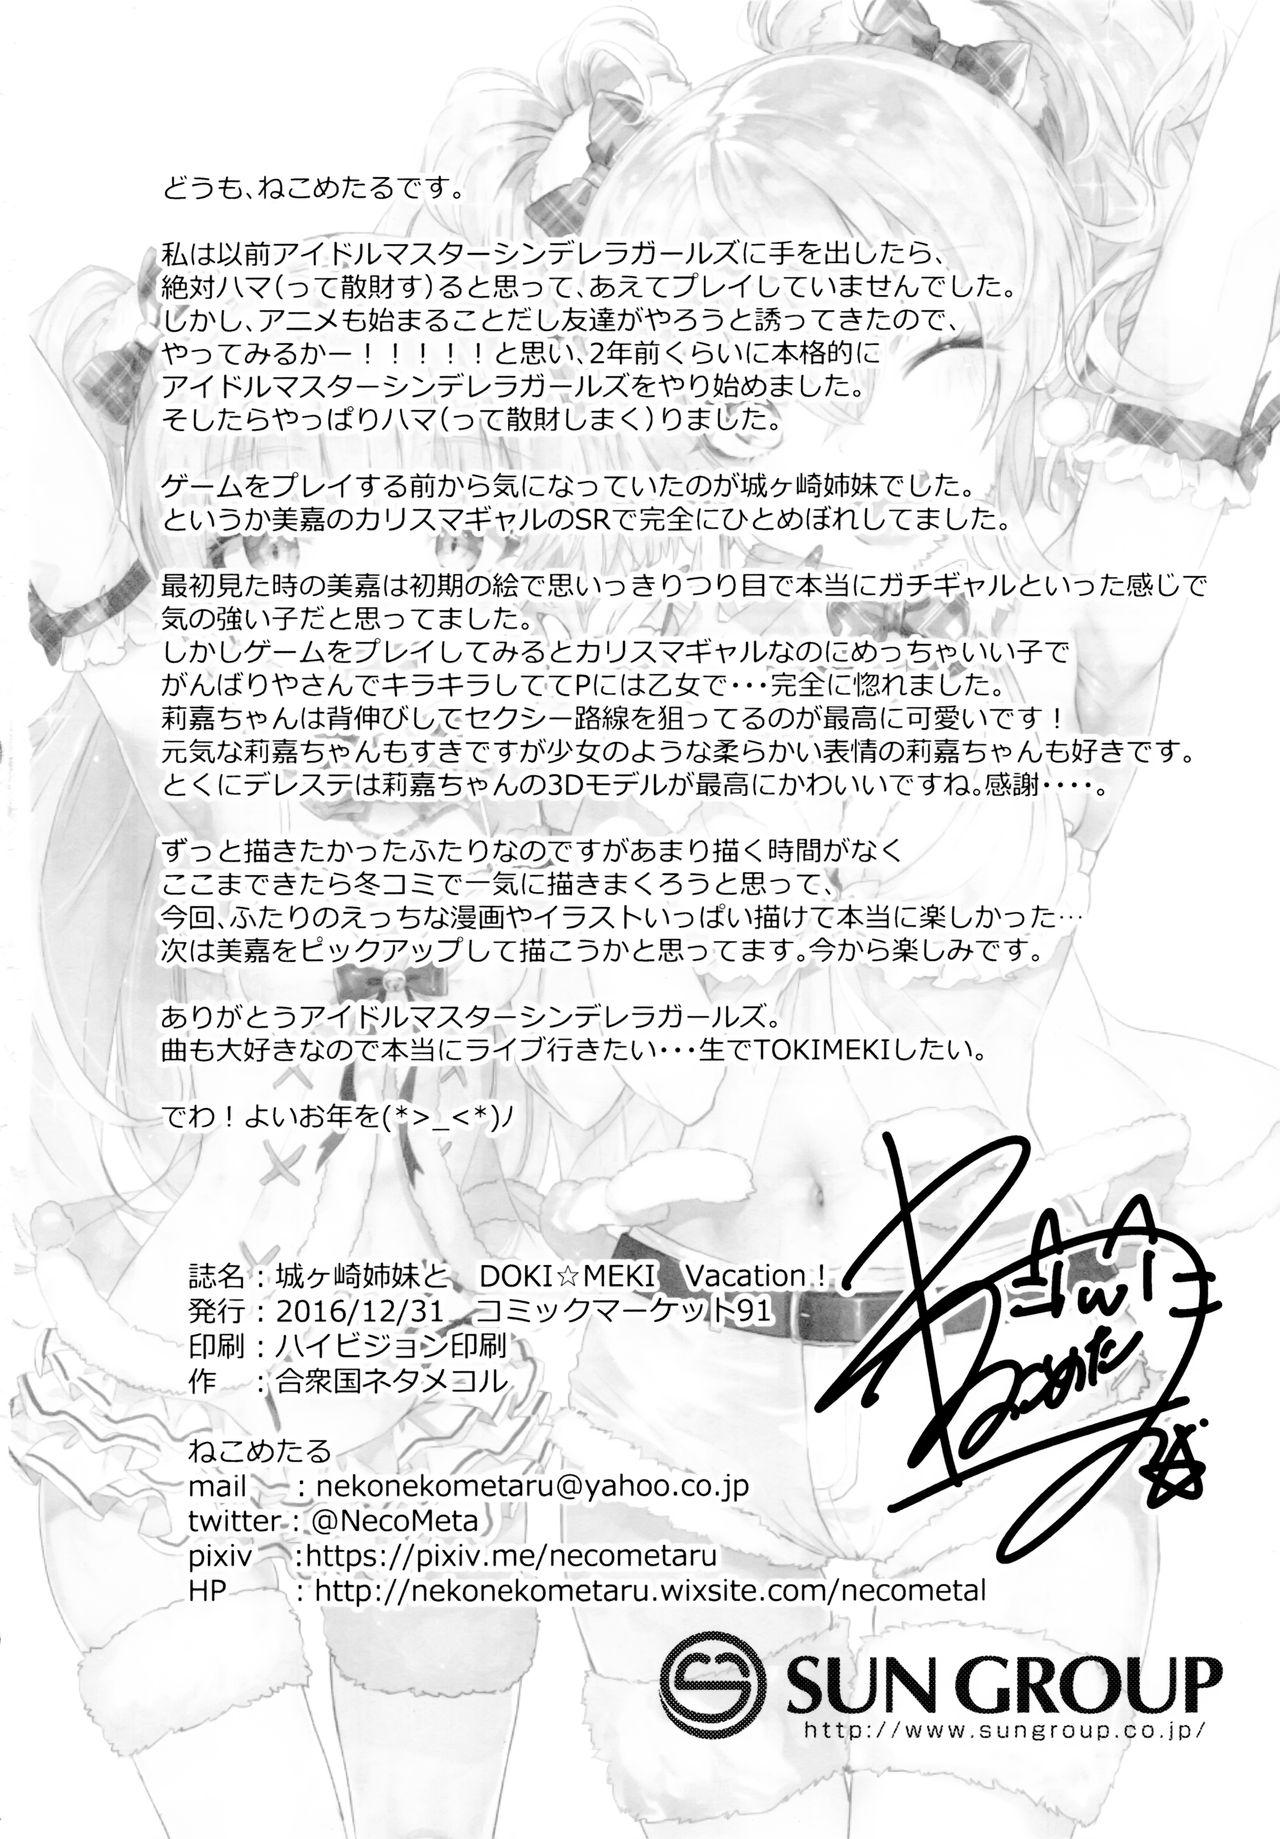 Jougasaki Shimai to DOKI MEKI Vacation! 19